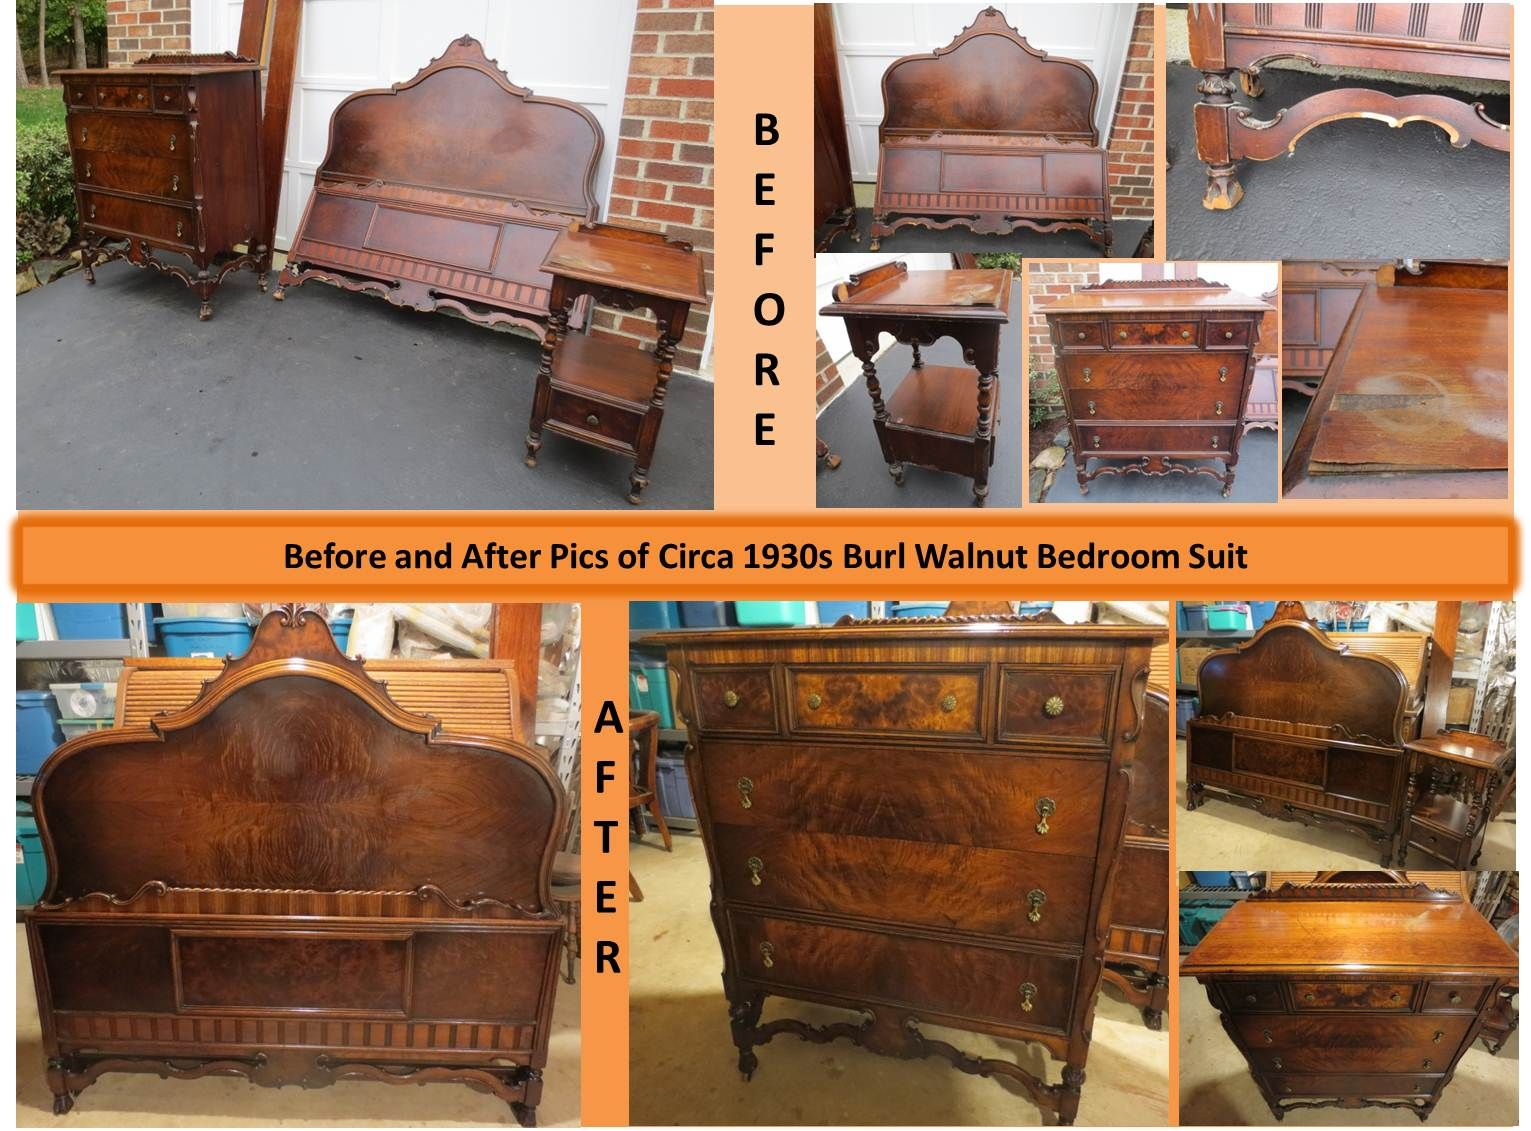 Ca 1920s Burl Walnut Bedroom Suite That I Red Refinished - Antique Walnut Bedroom Furniture - Furniture Designs